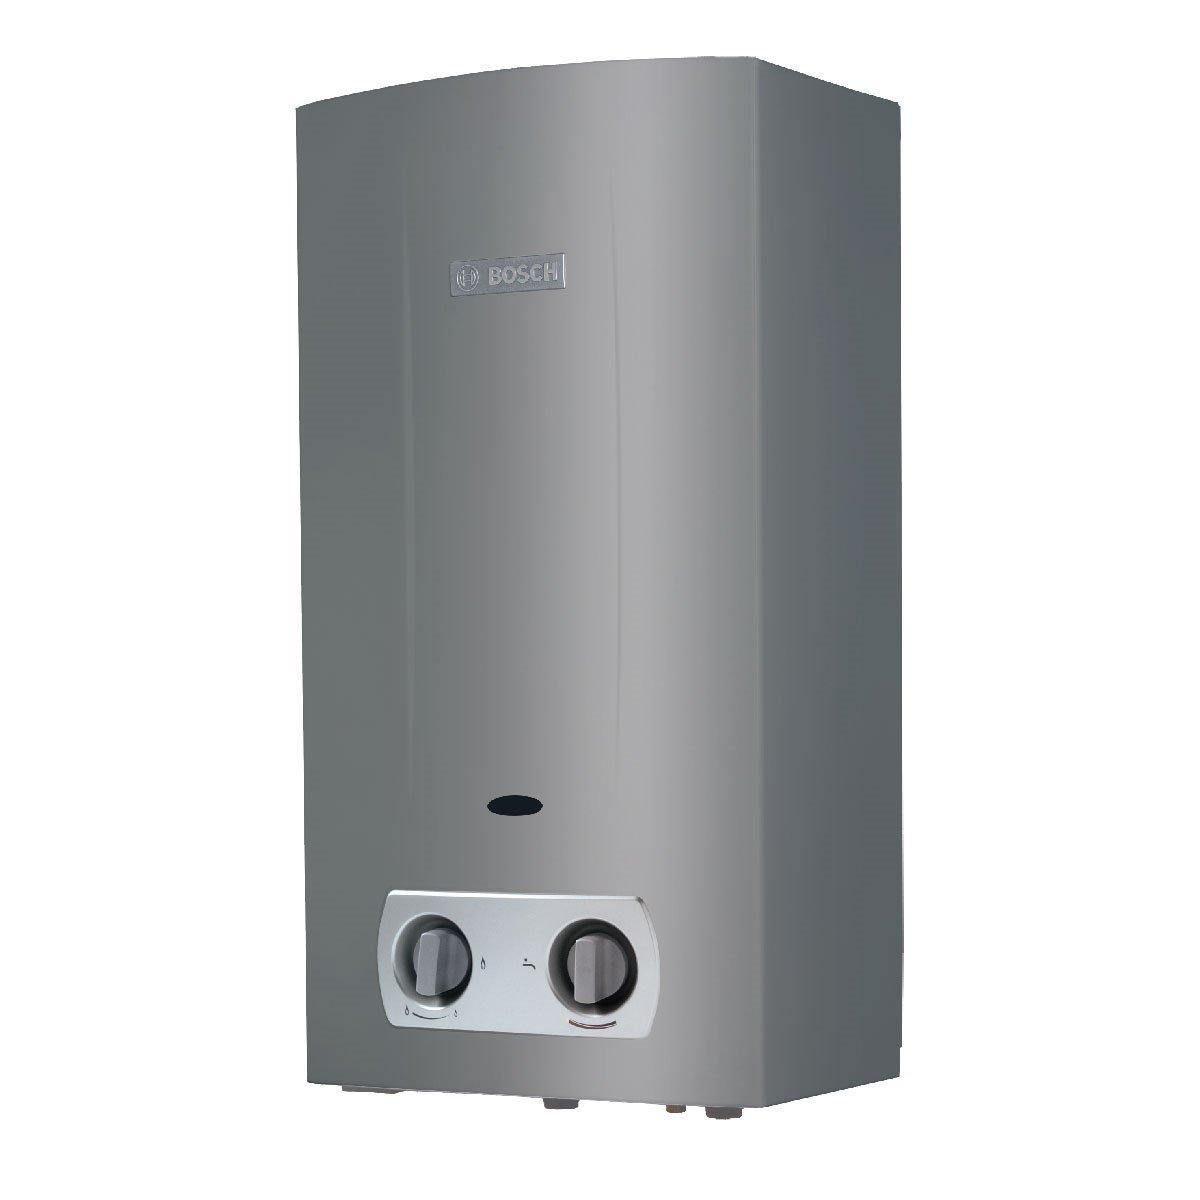 Calentador Bosch Confort Sii 13 Nat Clasica Silver